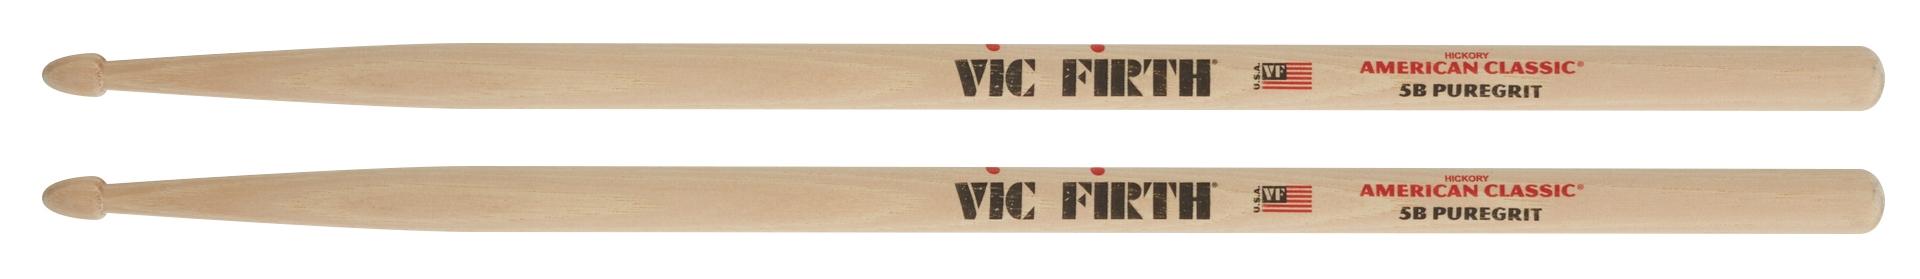 VIC FIRTH 5B Puregrit